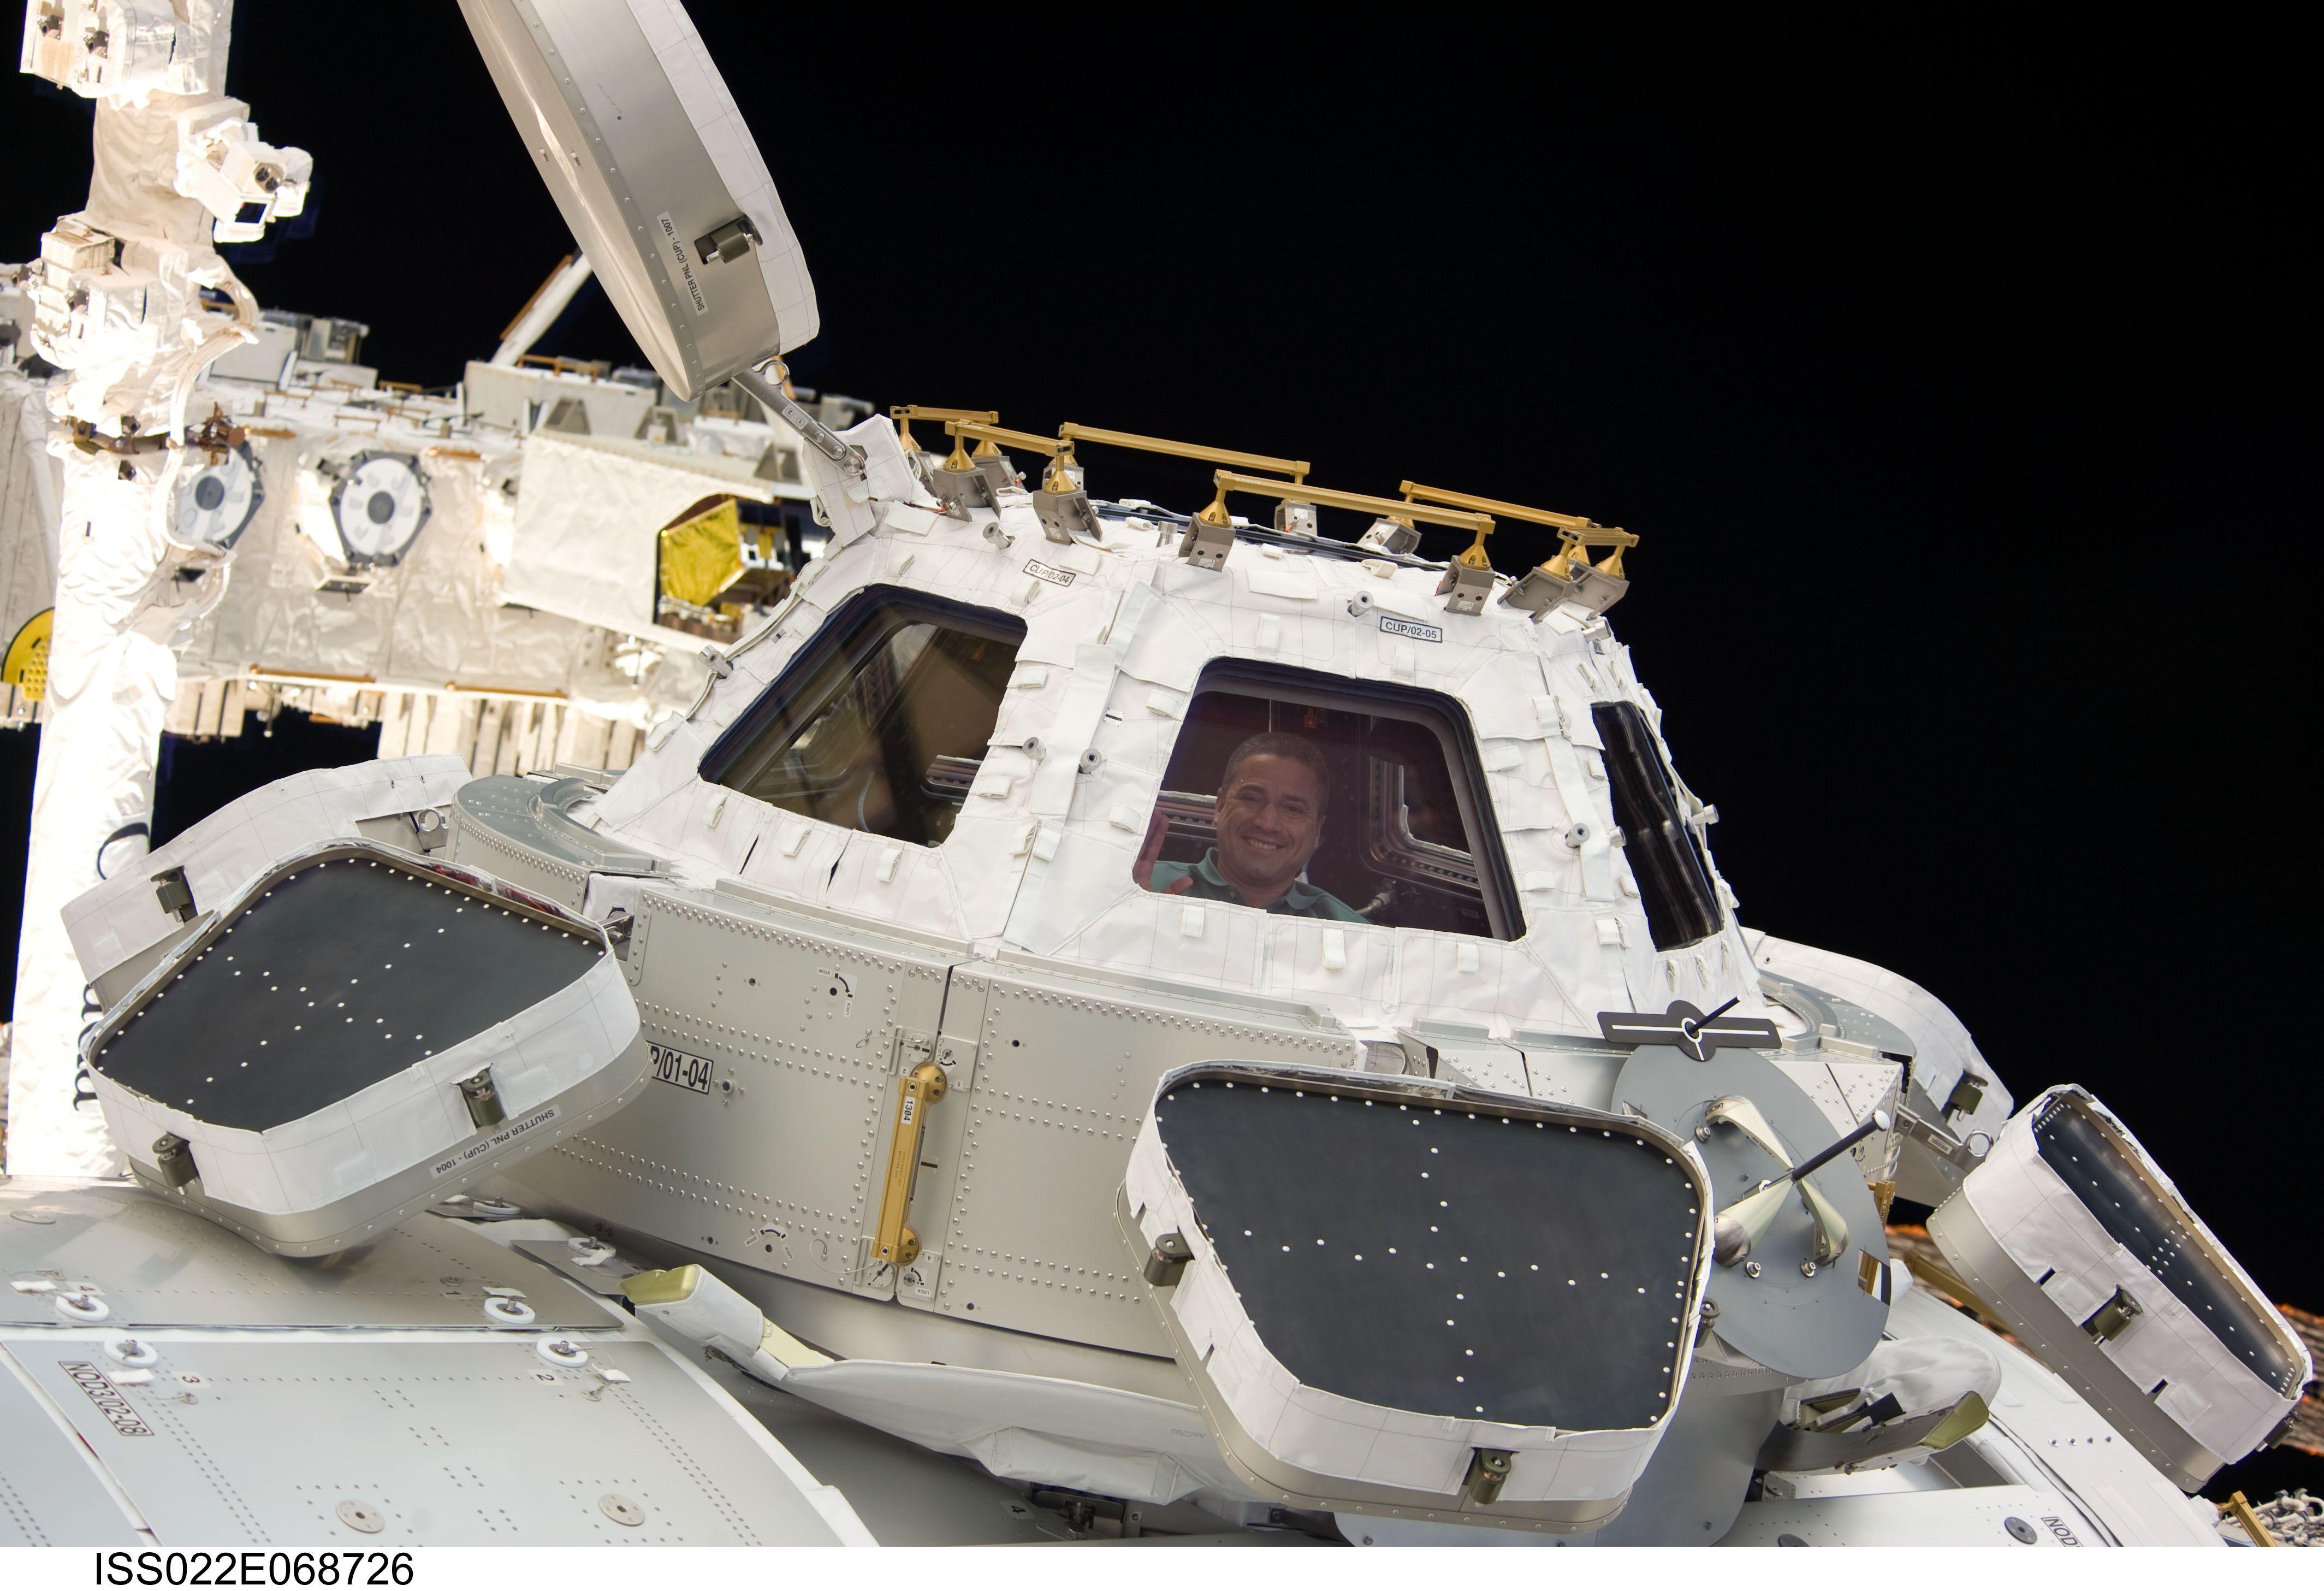 Cupola spacecraft module, white with windows all around